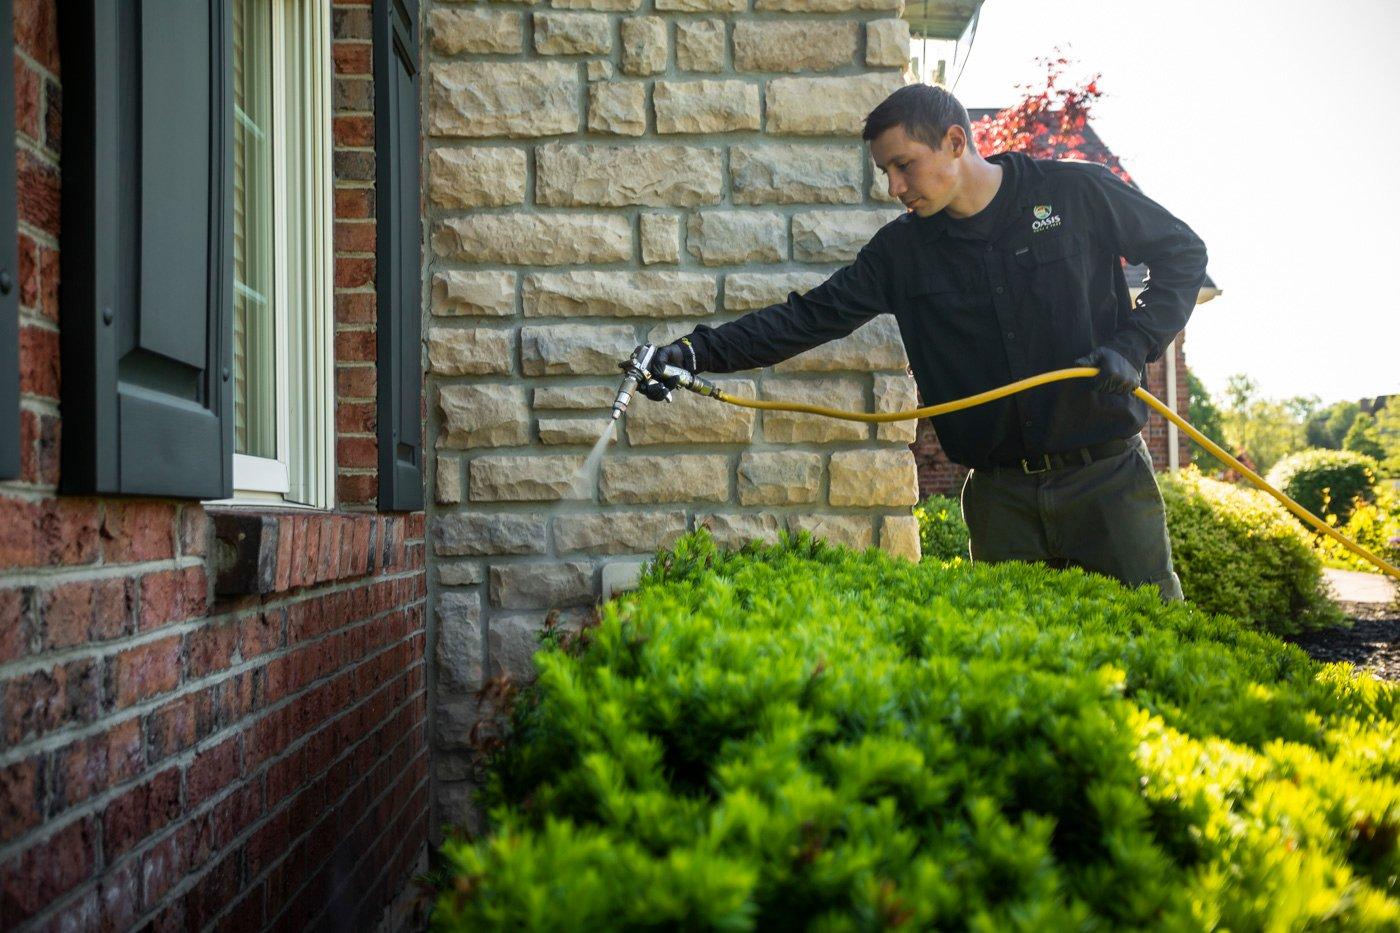 Perimeter pest control technician spraying home in Cincinnati